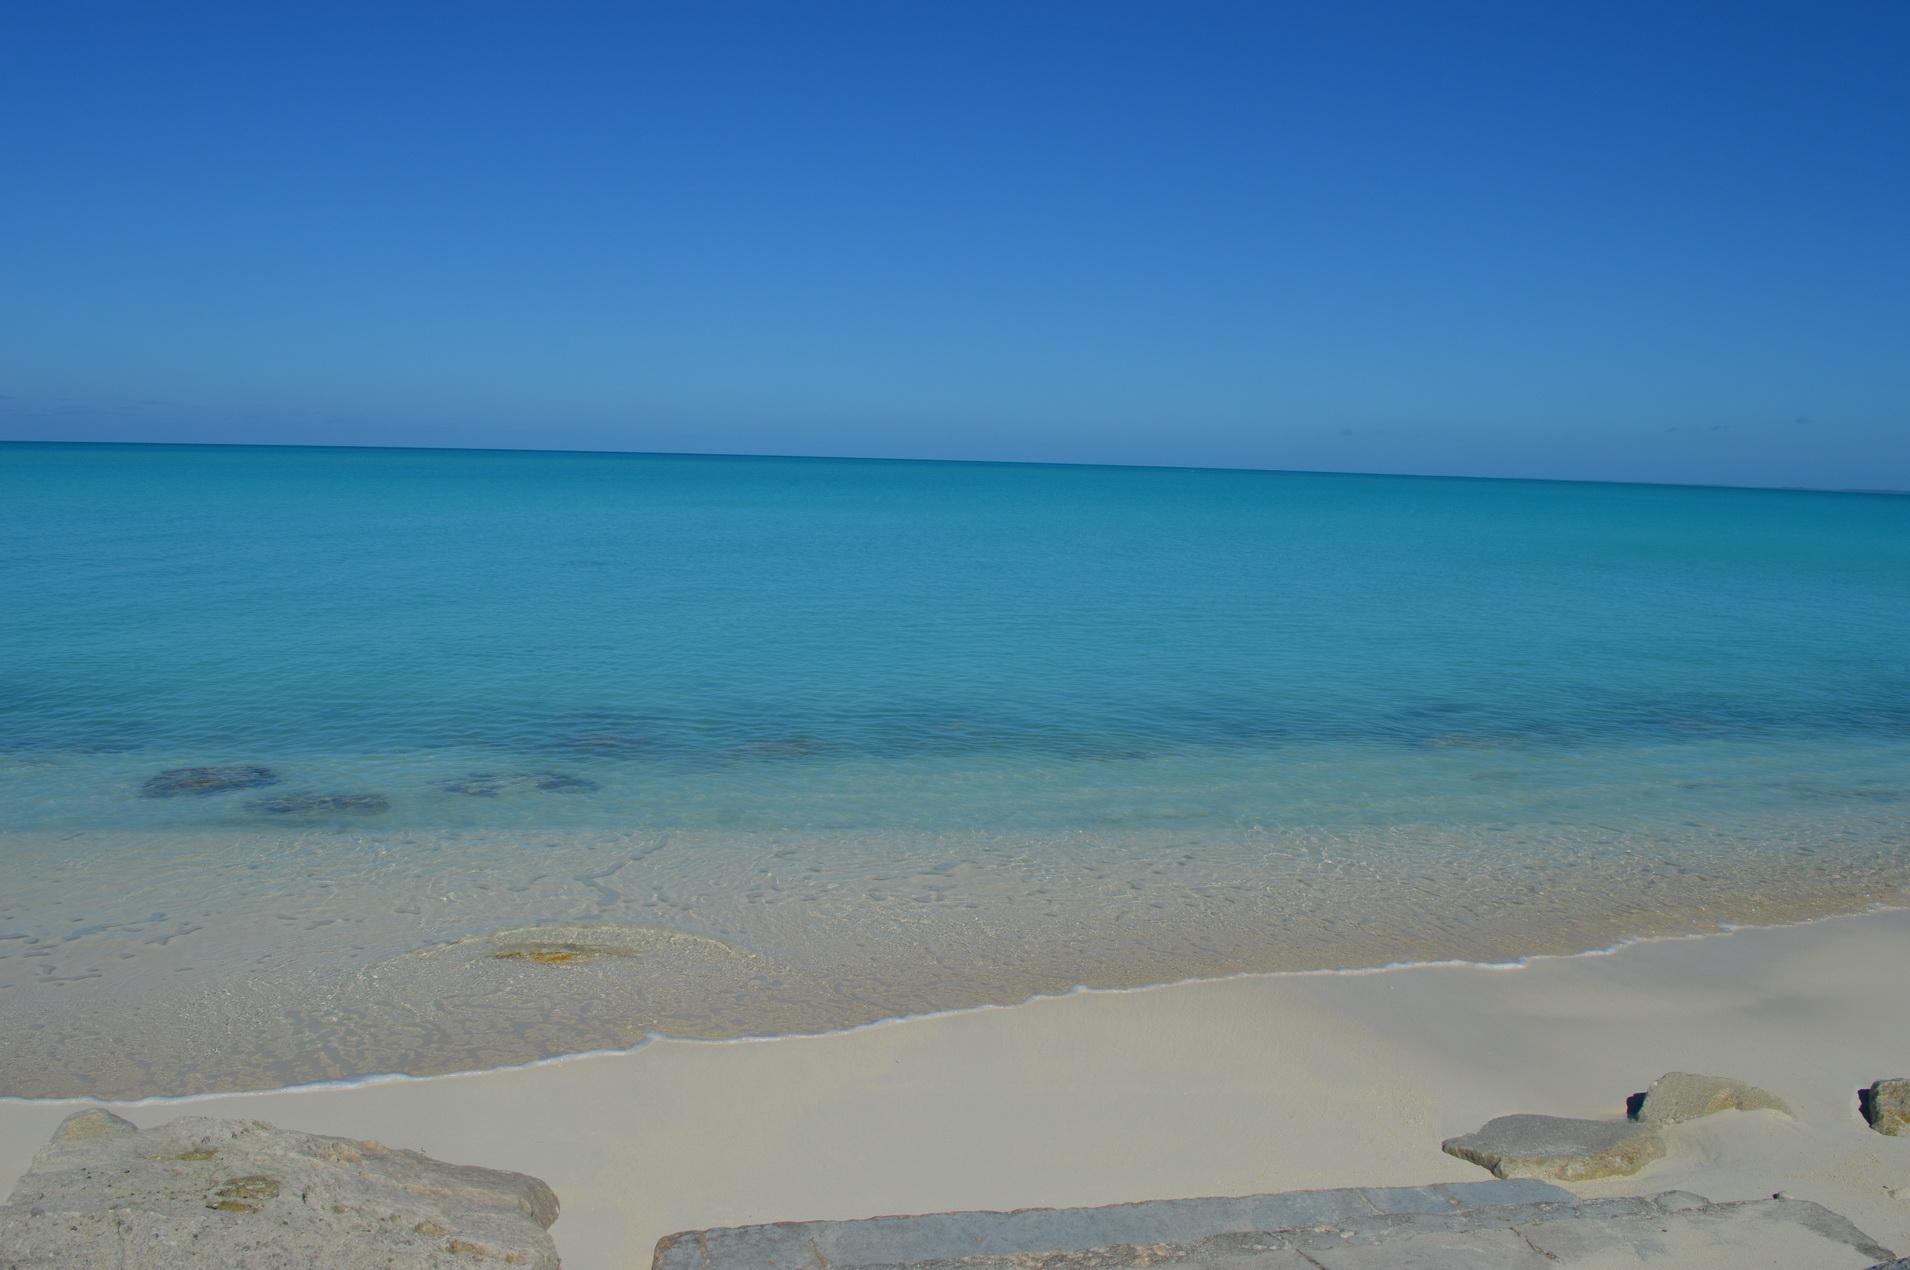 Land for Sale at Beachfront Lot #27, Hawk's Nest Cat Island MLS 29058 Hawks Nest, Cat Island, Bahamas